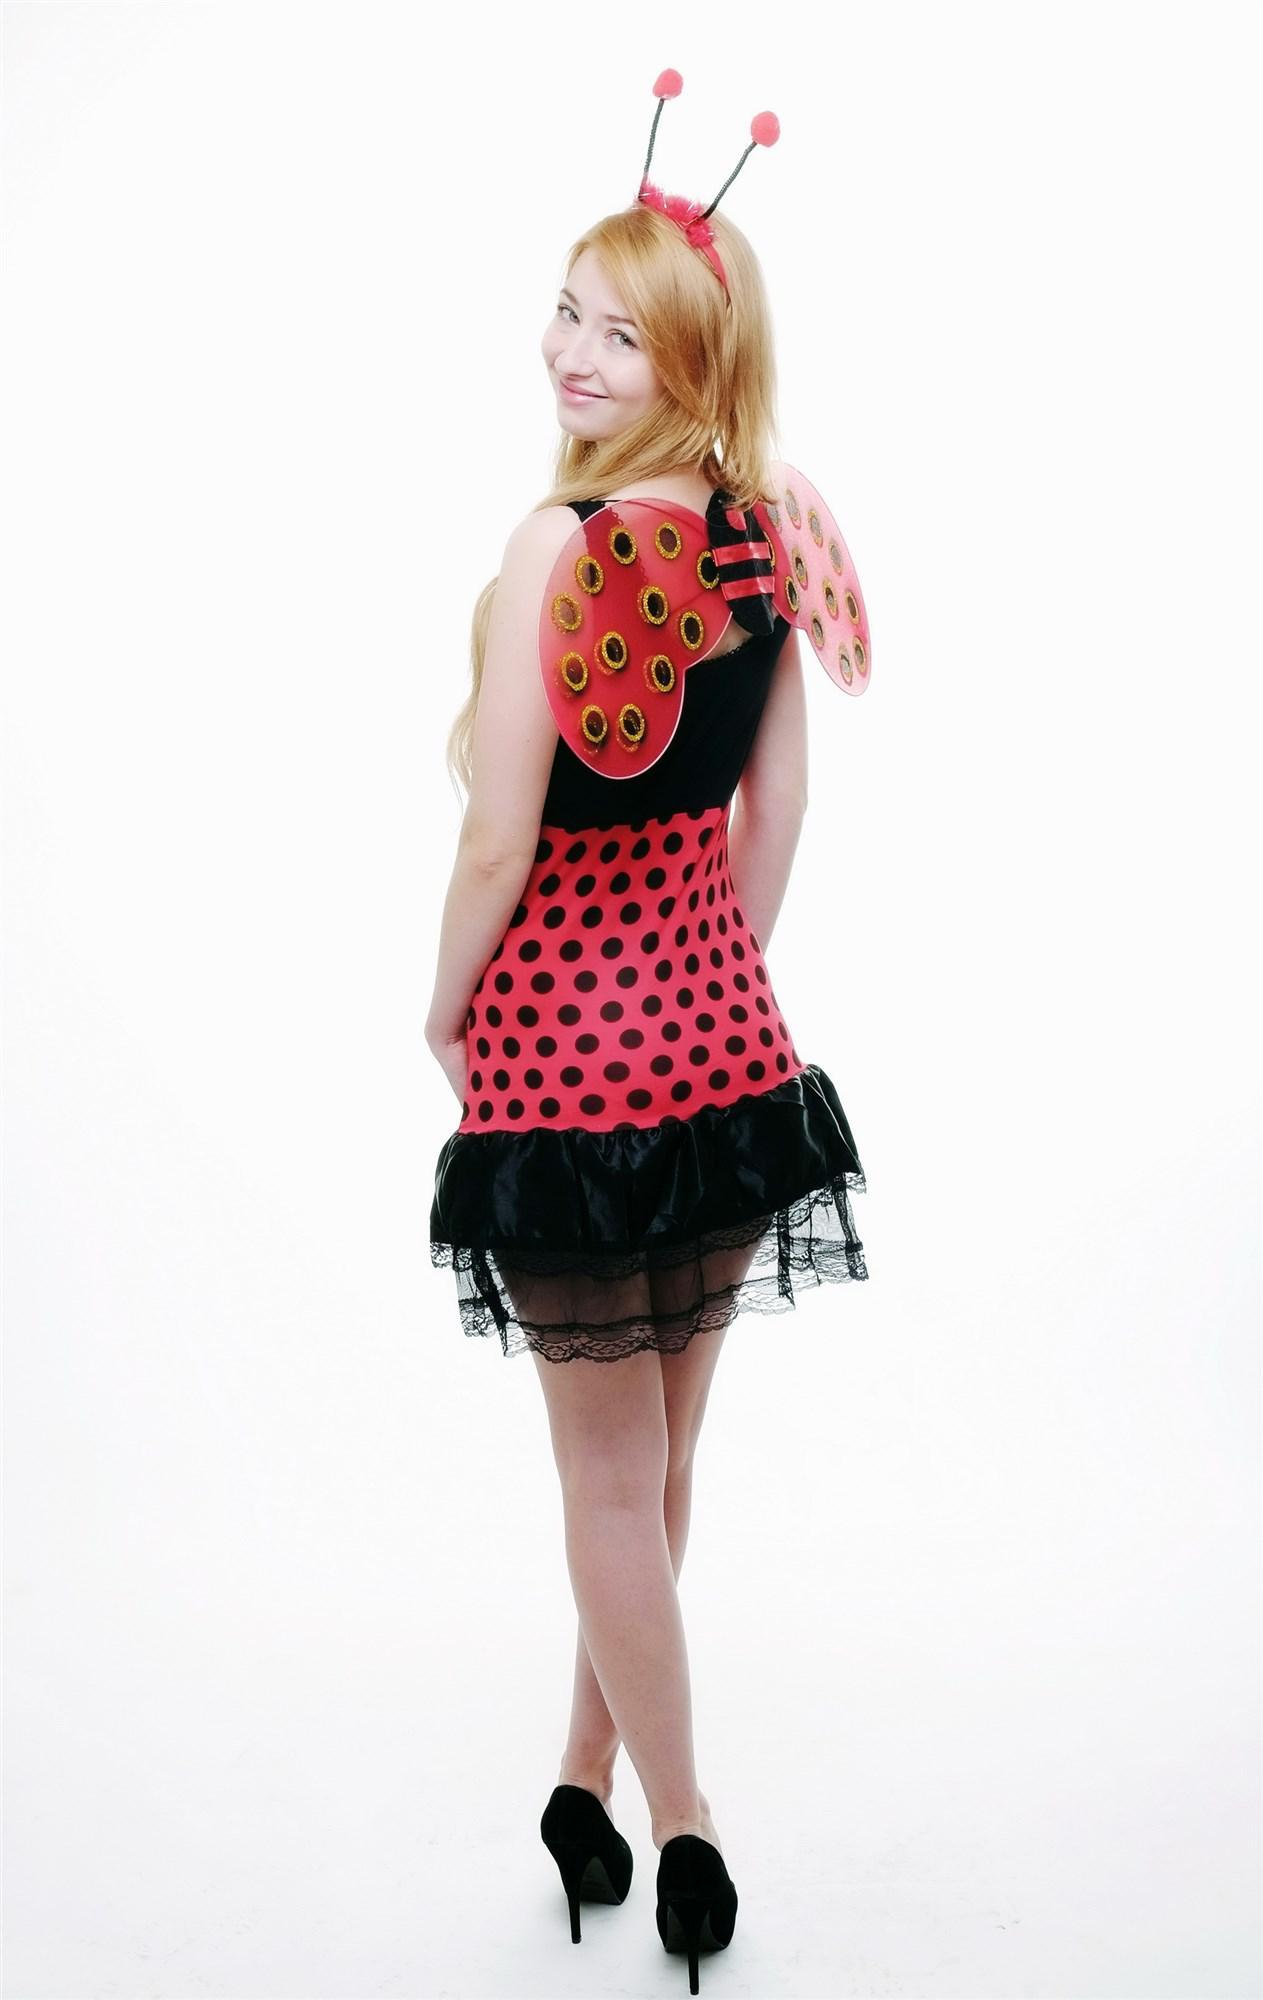 kost m damen komplett set sexy marienk fer k fer teenie ladybug. Black Bedroom Furniture Sets. Home Design Ideas